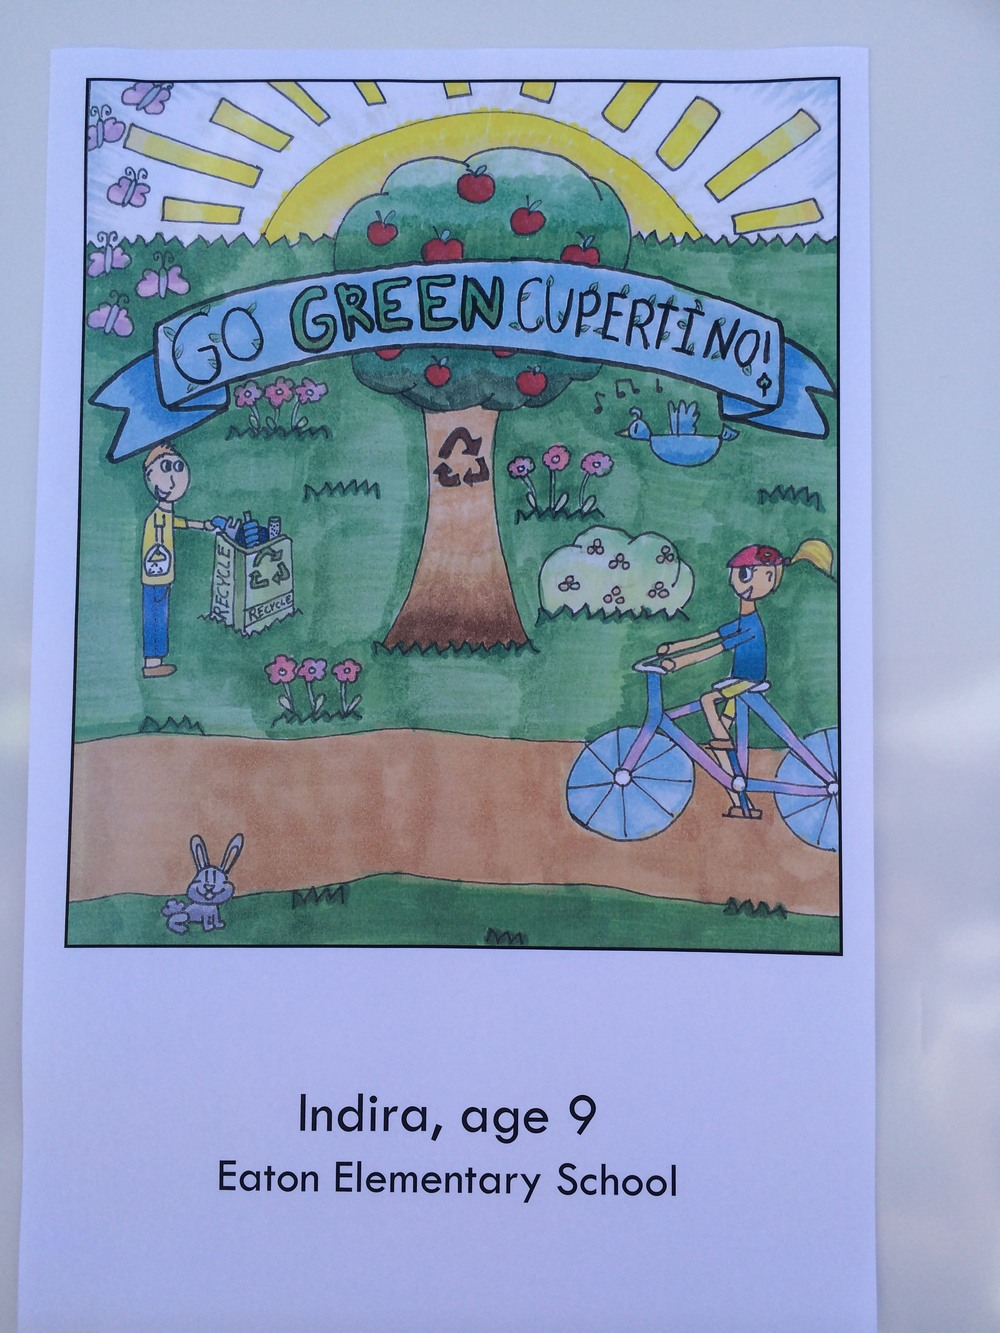 IndiraAbhyanker-2014-Cupertino-ReusableBagCompetition.JPG